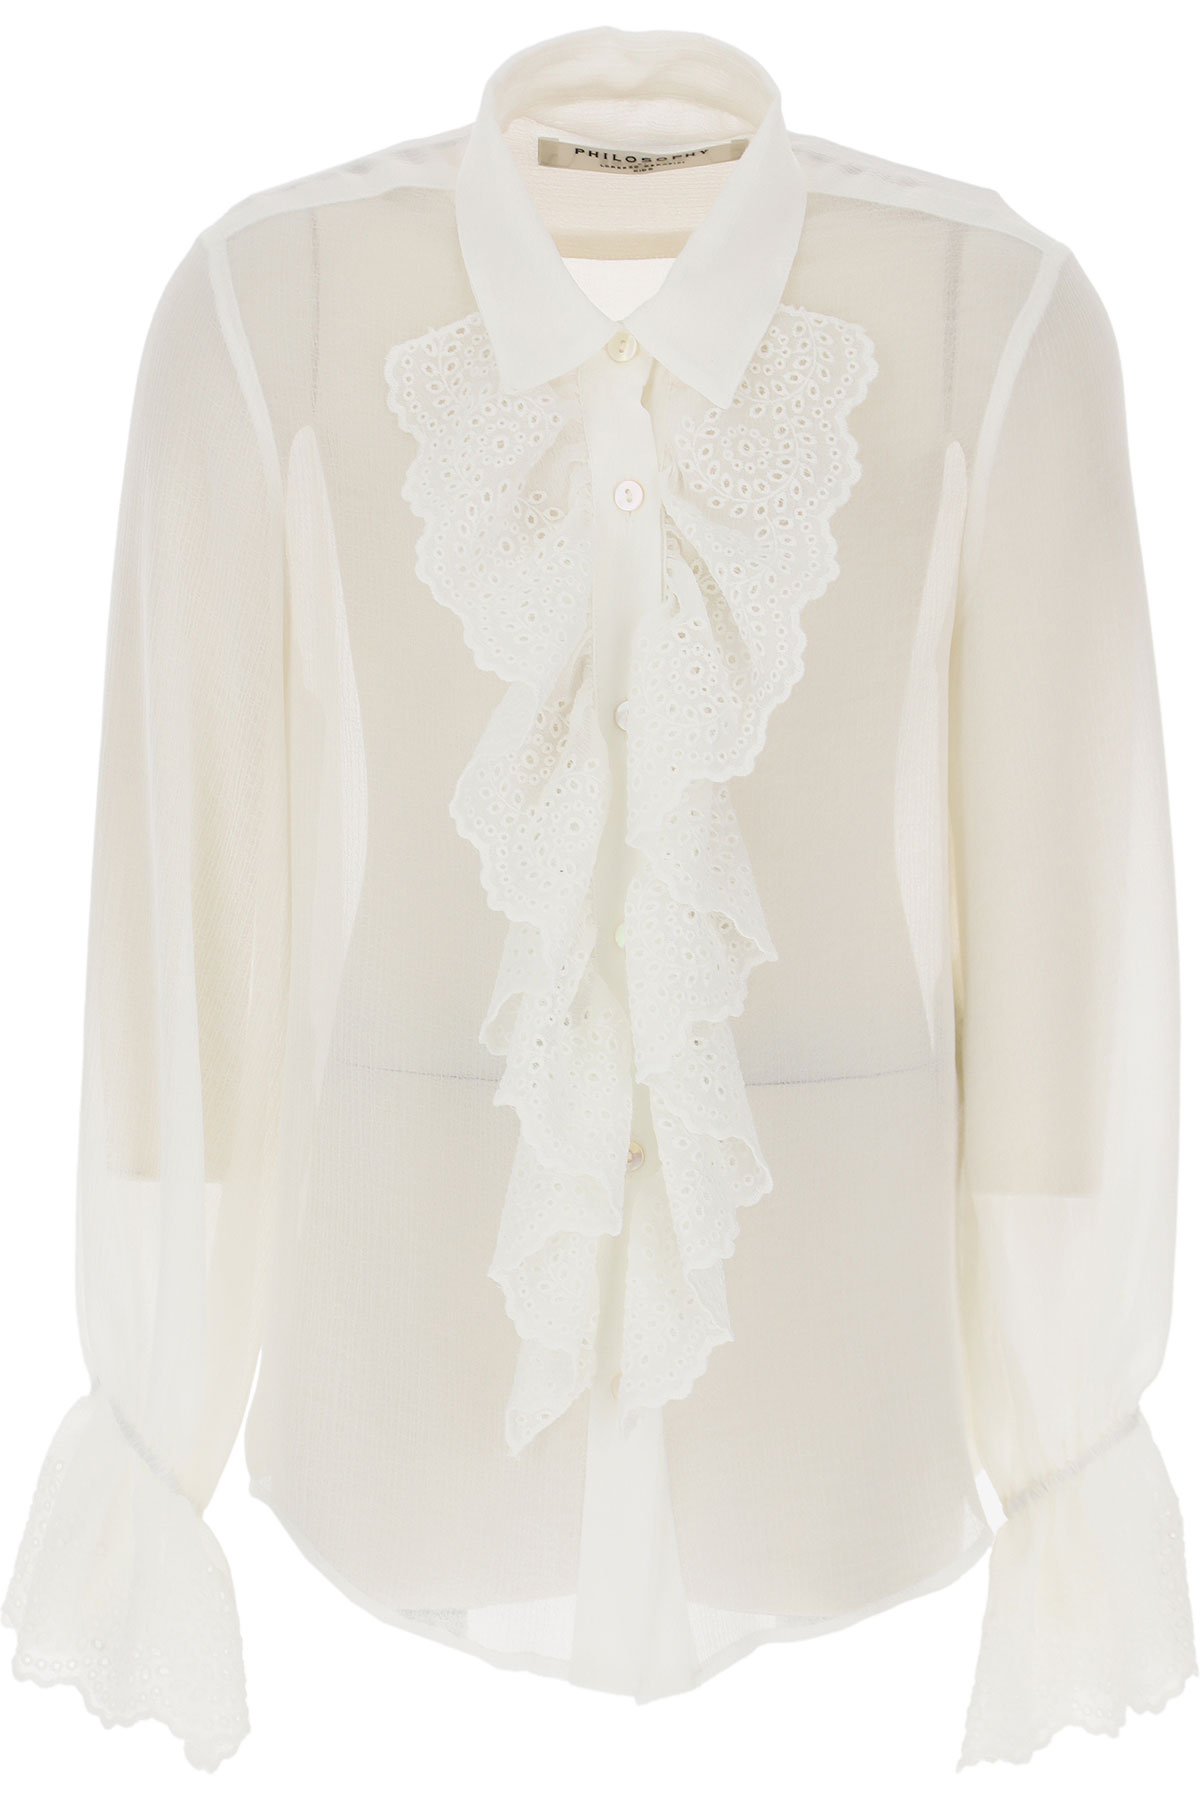 Philosophy di Lorenzo Serafini Kids Shirts for Girls On Sale, White, polyester, 2019, L M S XL